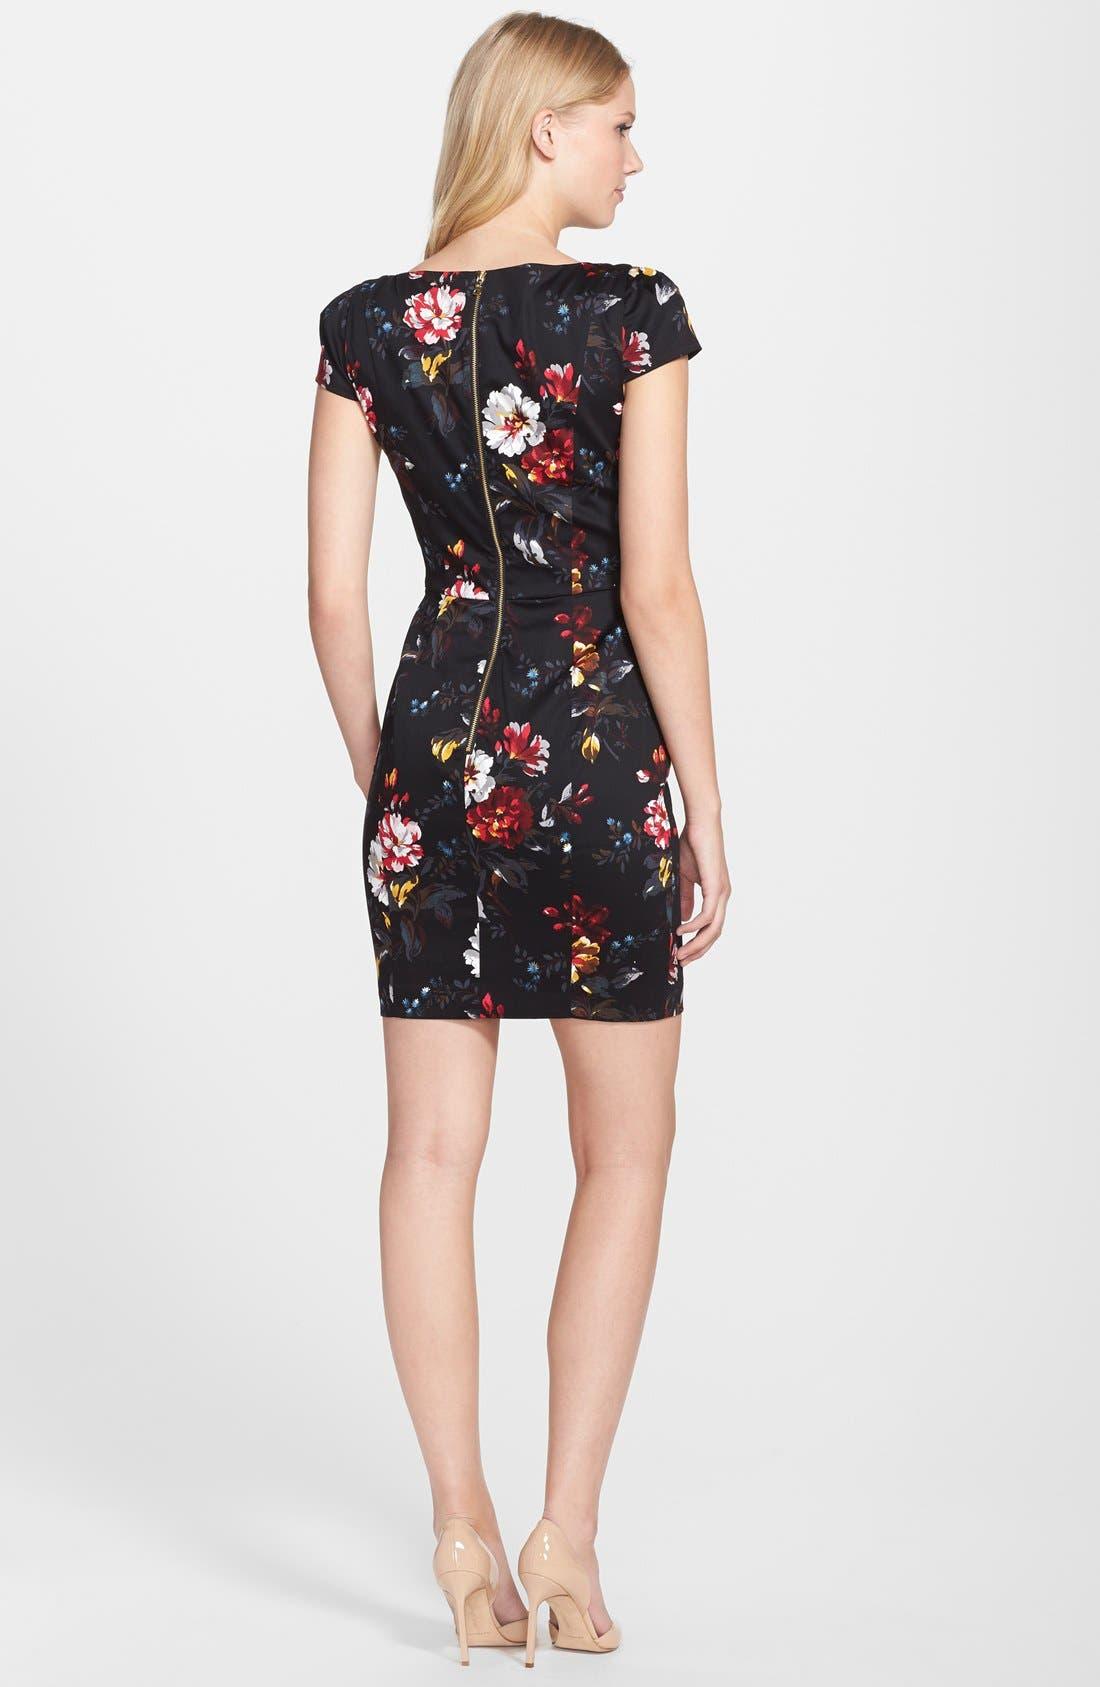 'Gardini' Floral Print Cotton Sheath Dress,                             Alternate thumbnail 2, color,                             006